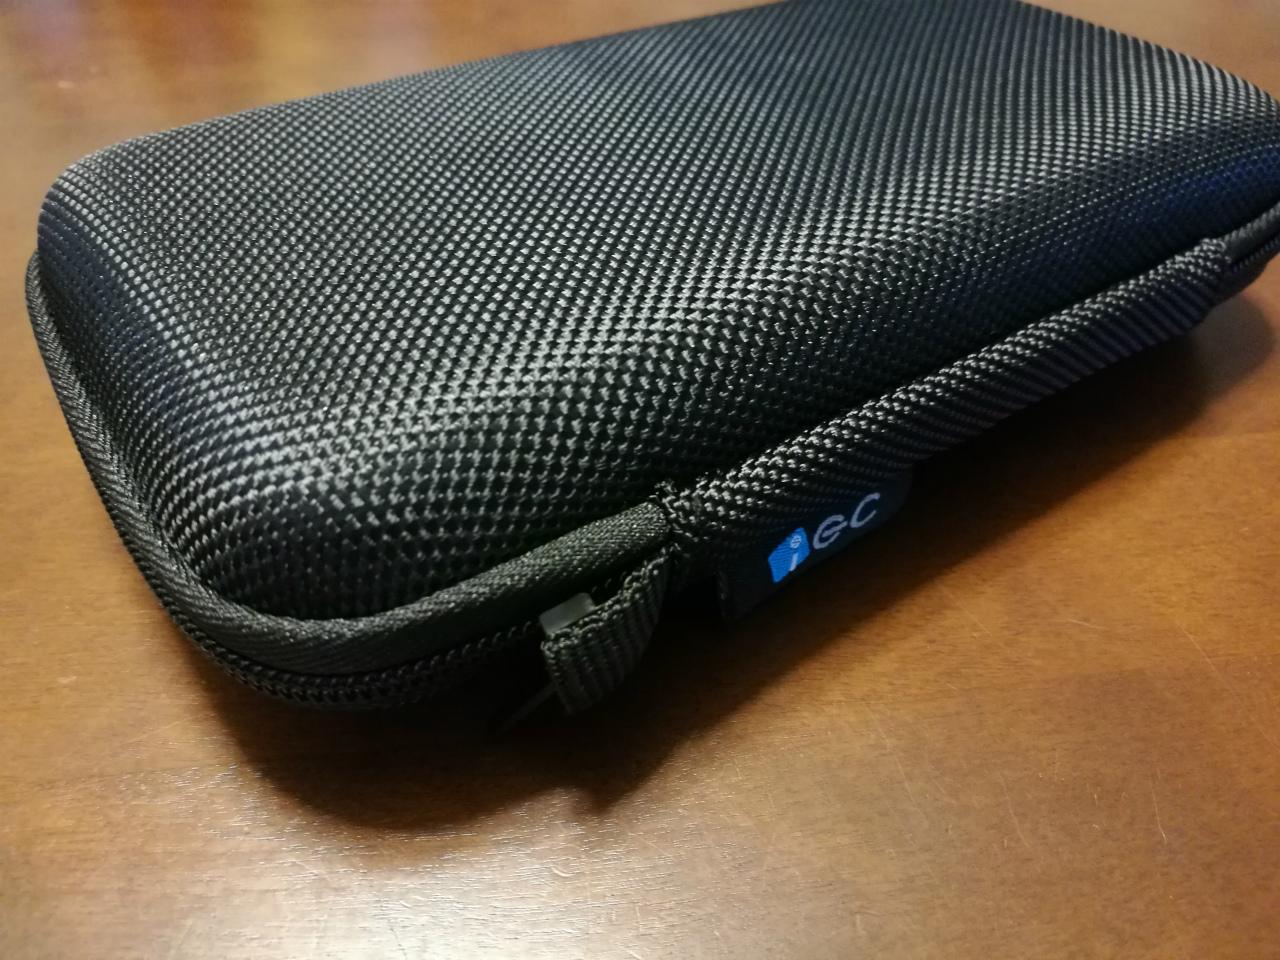 pr-ec-technology-mobile-battery-case-01